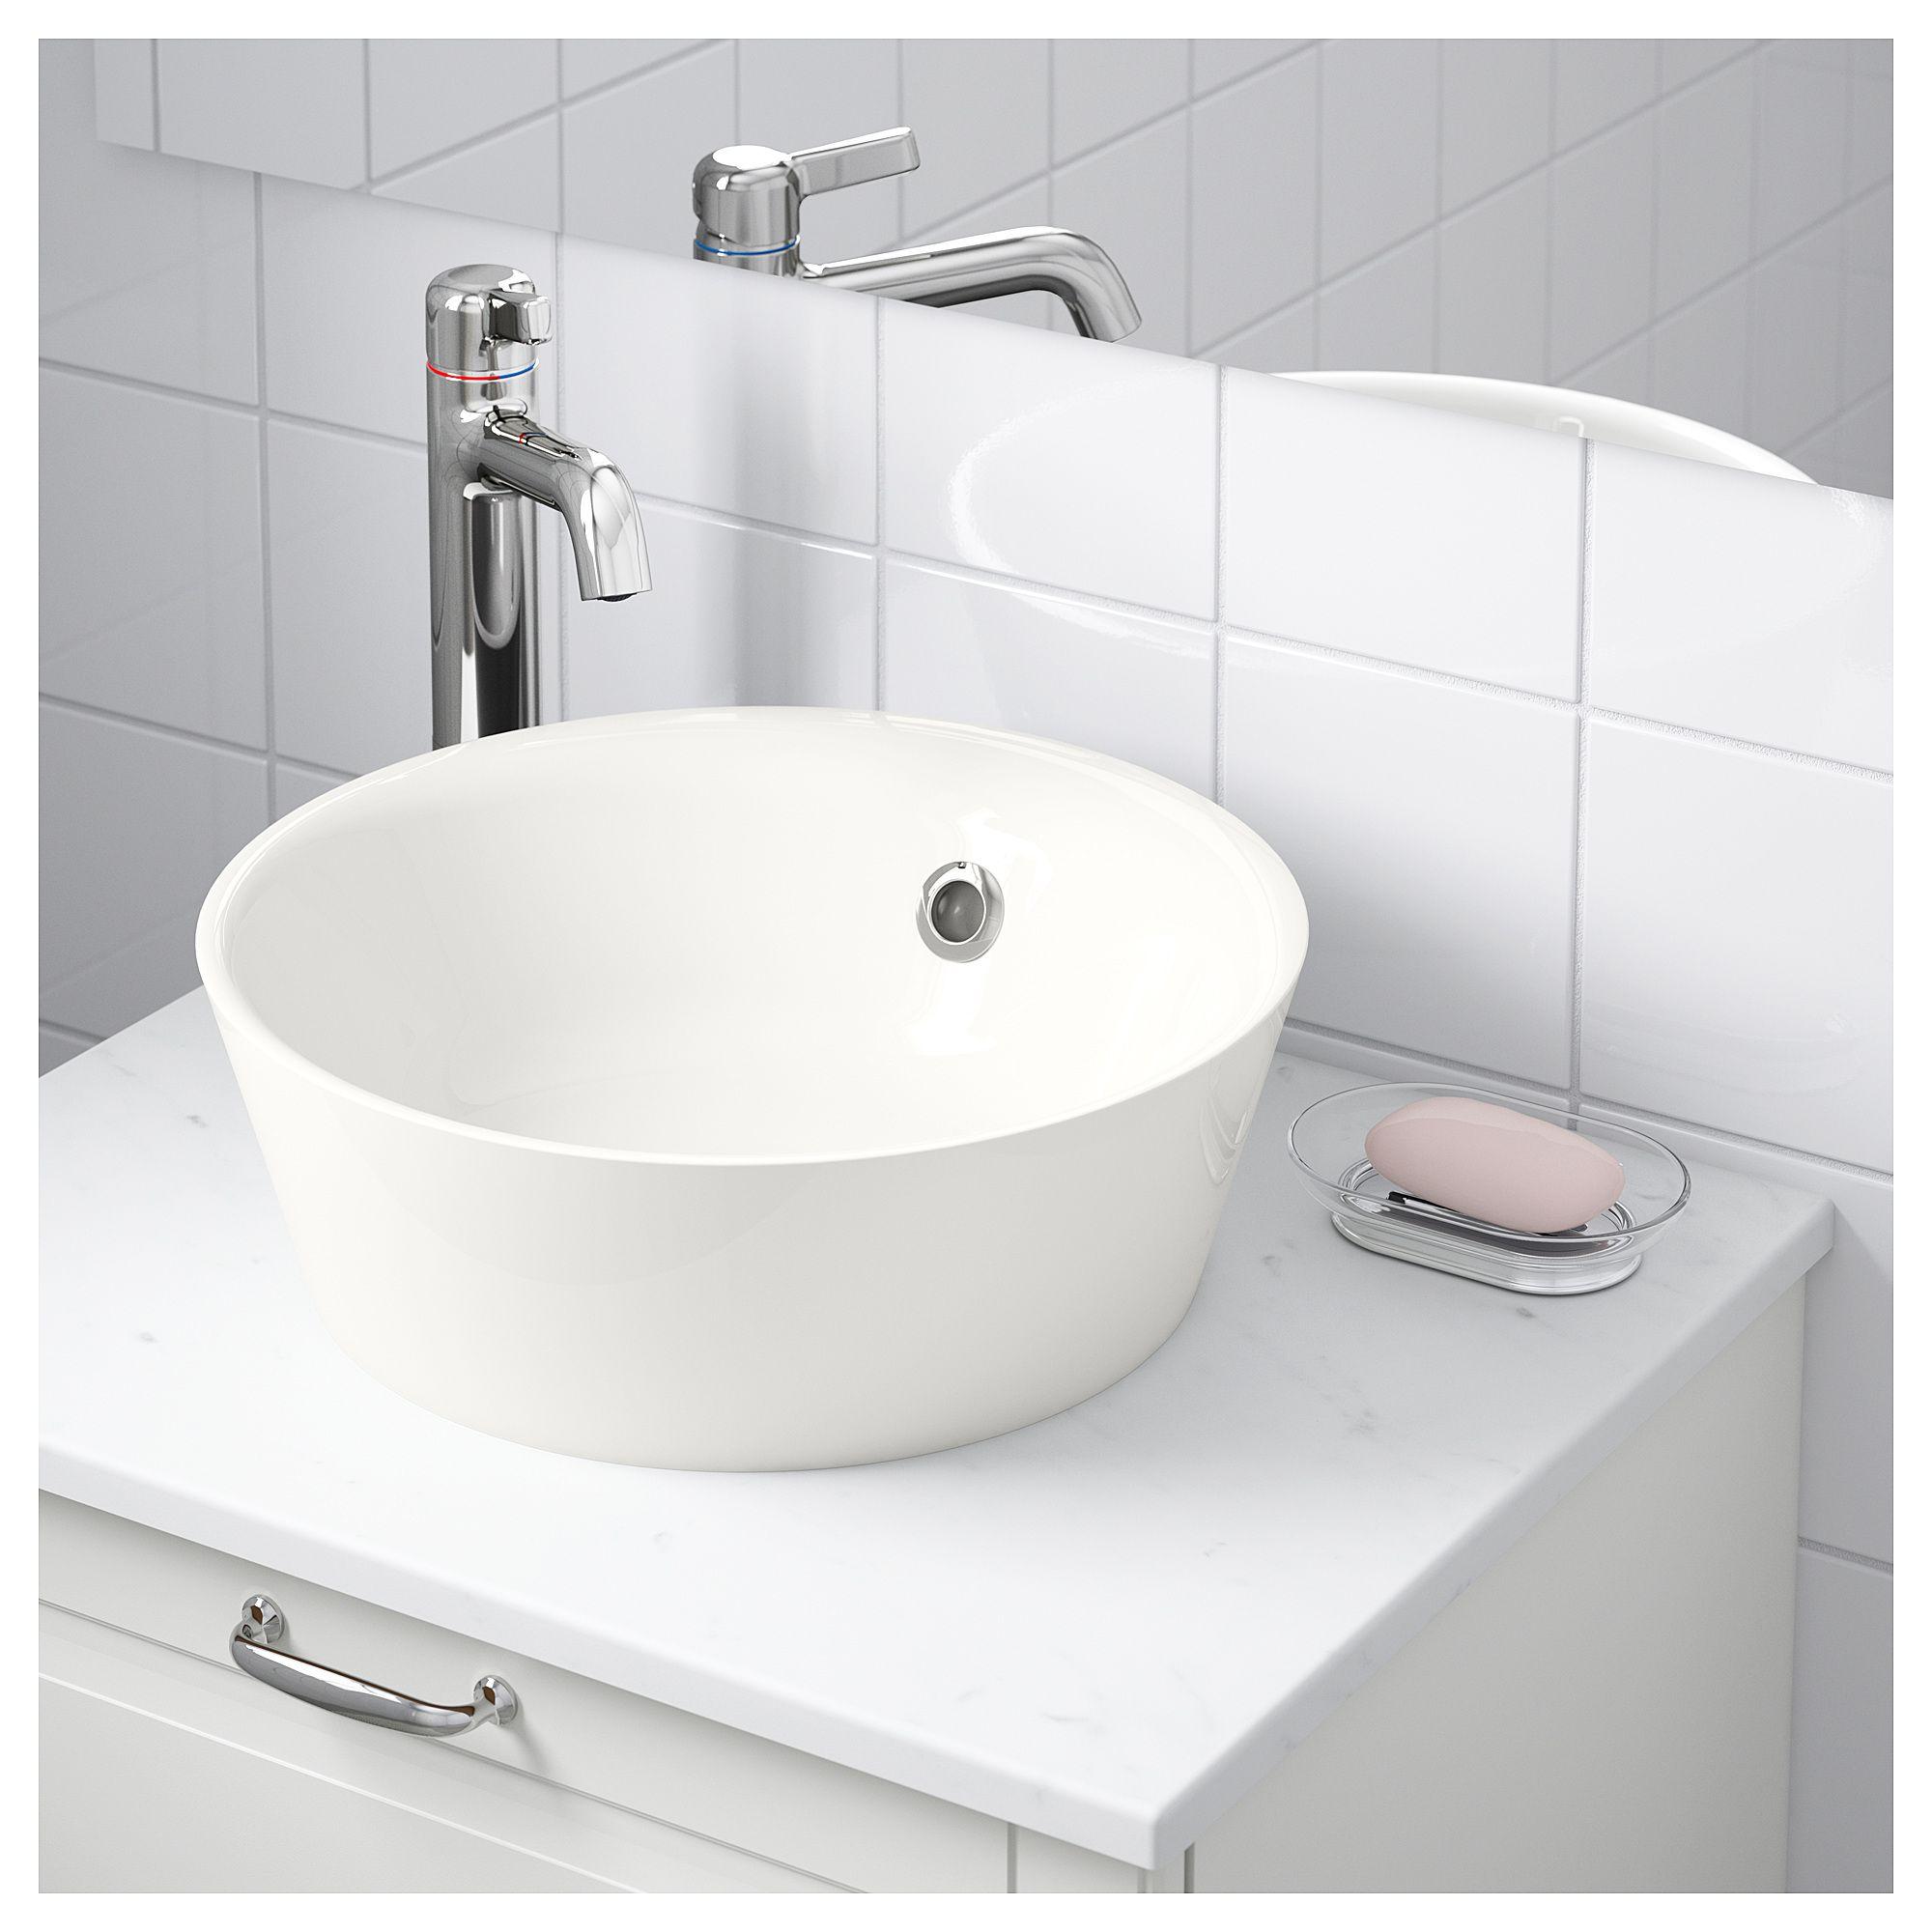 kattevik countertop sink white dise o de ba os pinterest rh pinterest com